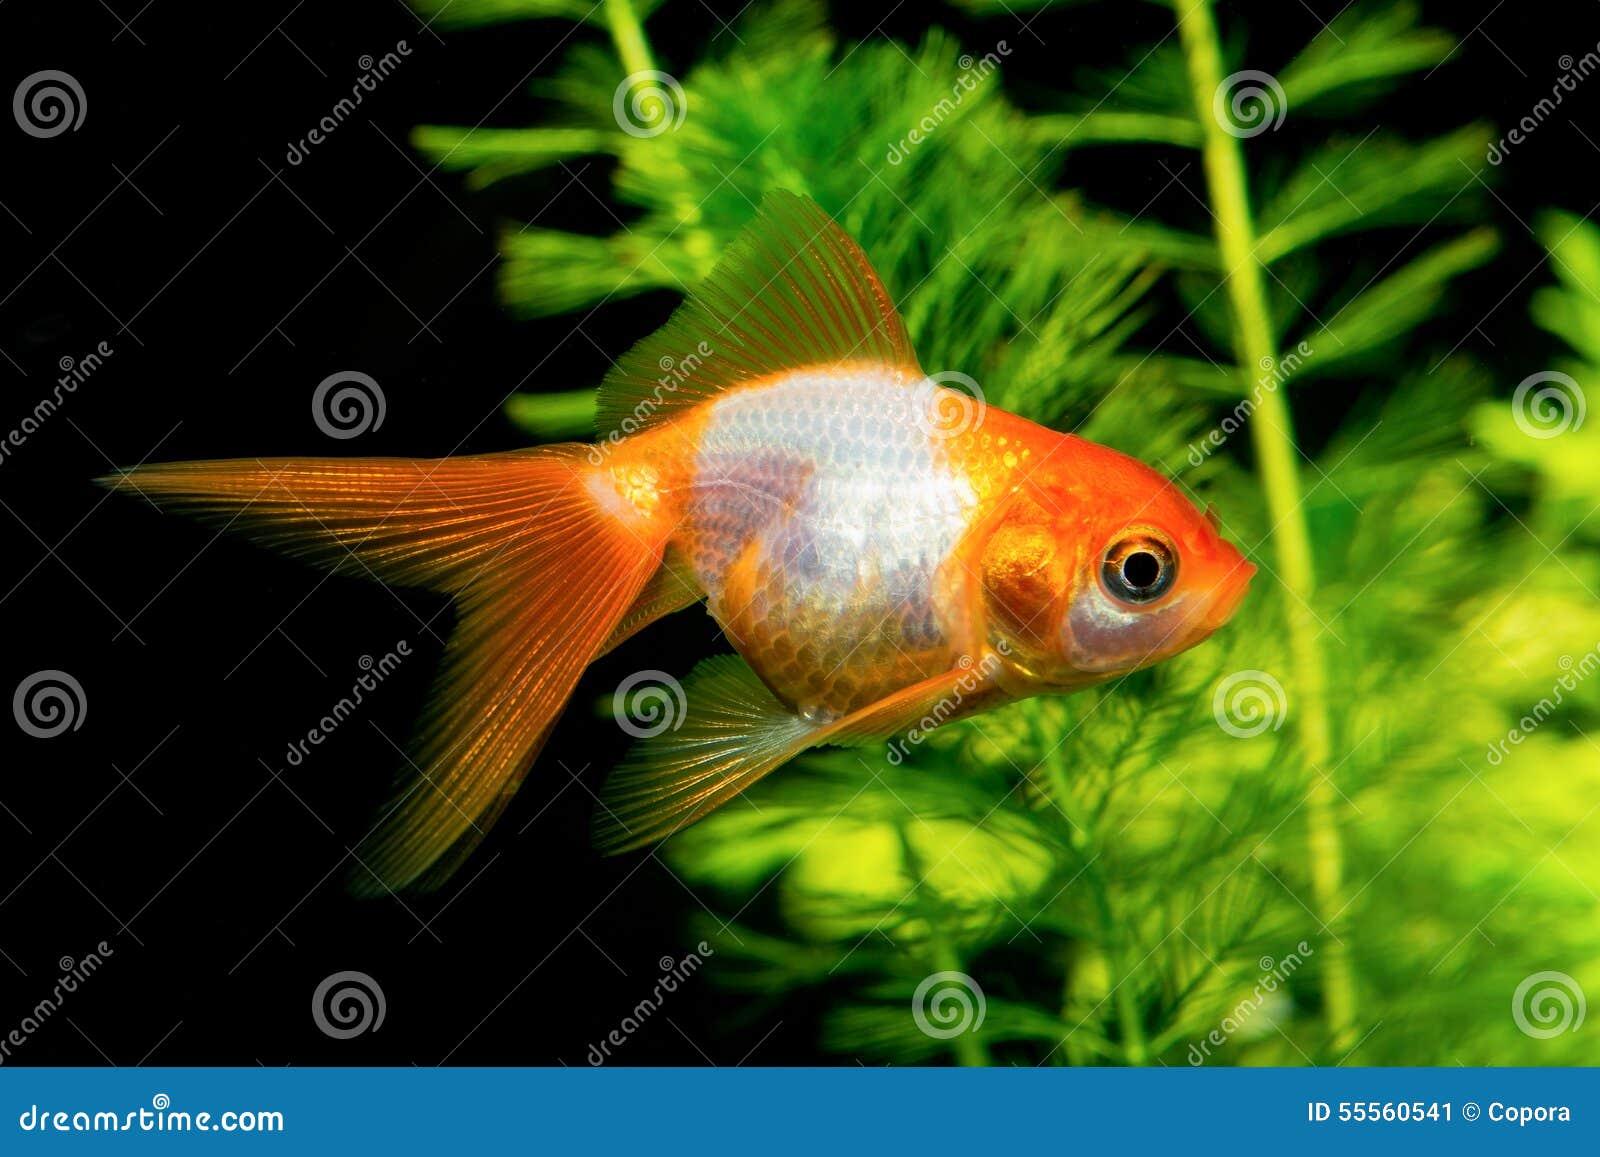 Poisson rouge orange blanc photo stock image 55560541 for Poisson rouge immobile fond aquarium